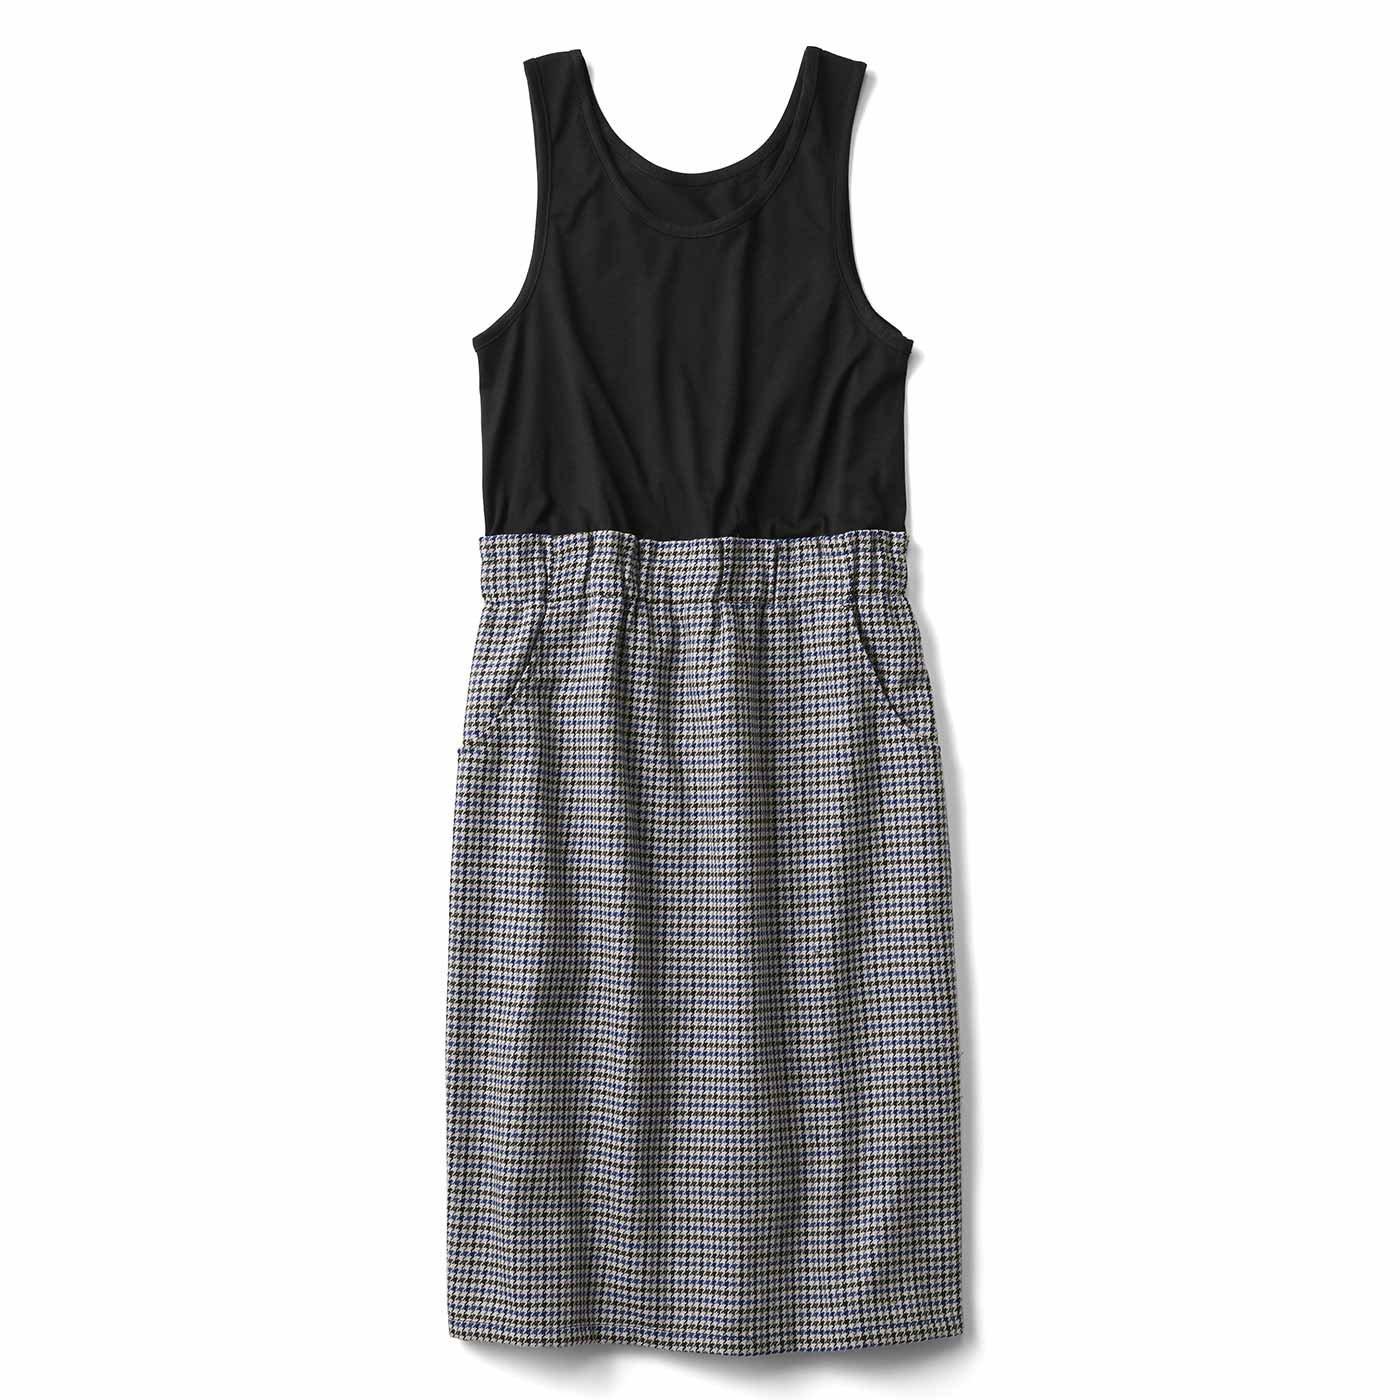 IEDIT[イディット] 上から吊(つ)ってるみたいでウエスト快適 タンクトップ付きシック柄チェックのⅠラインスカート〈ブルー〉